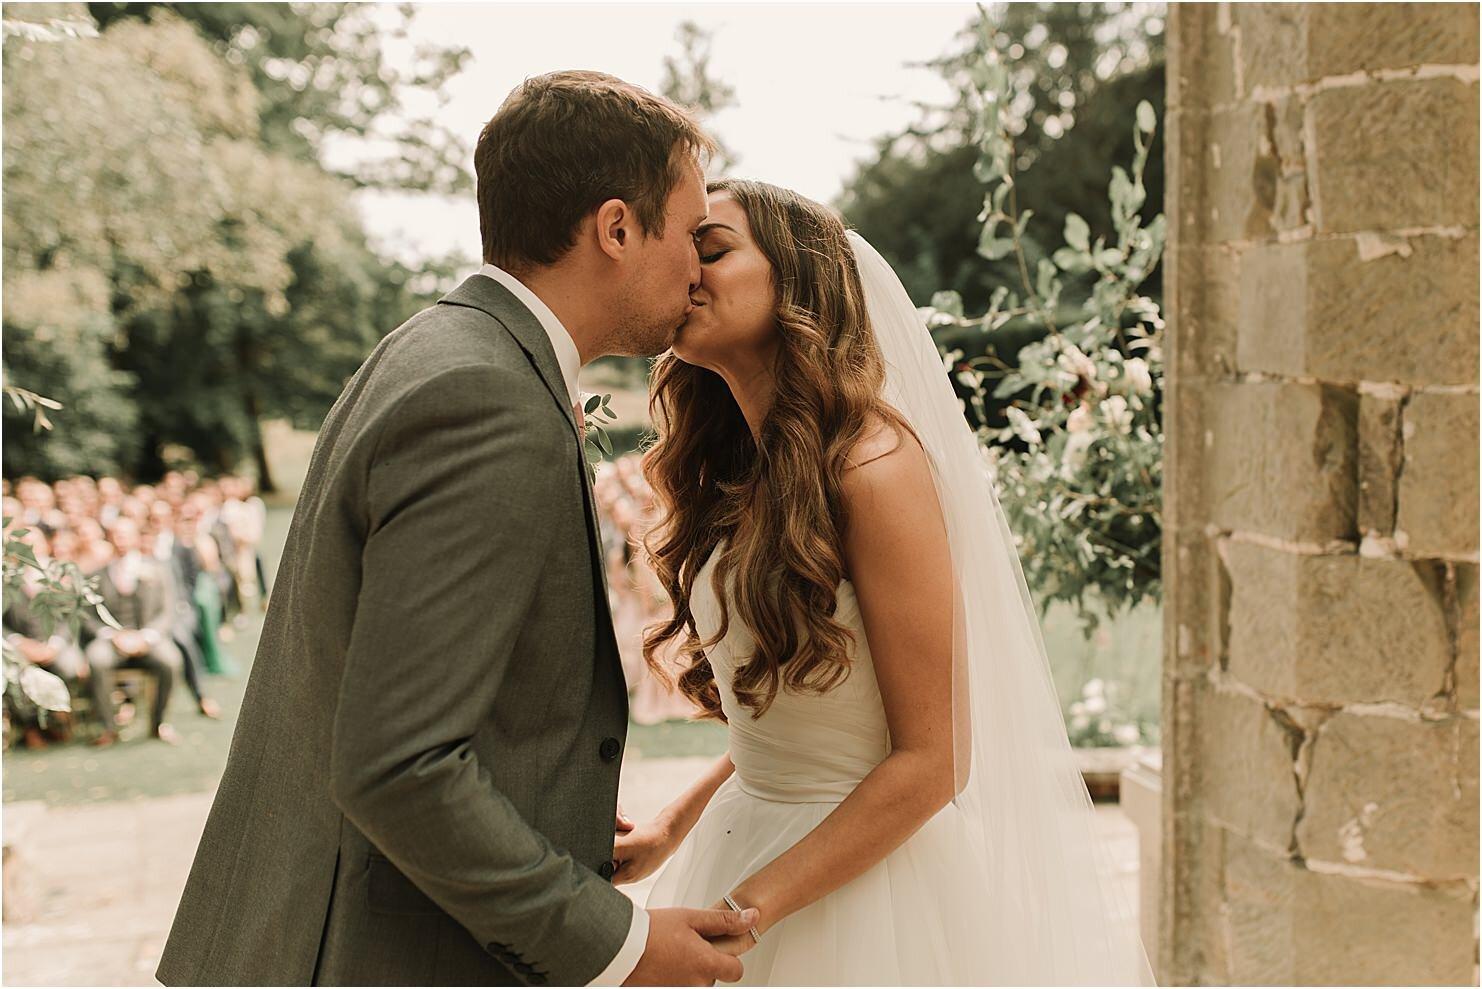 boda-de-cuento-en-castillo-boda-en-londres-56.jpg